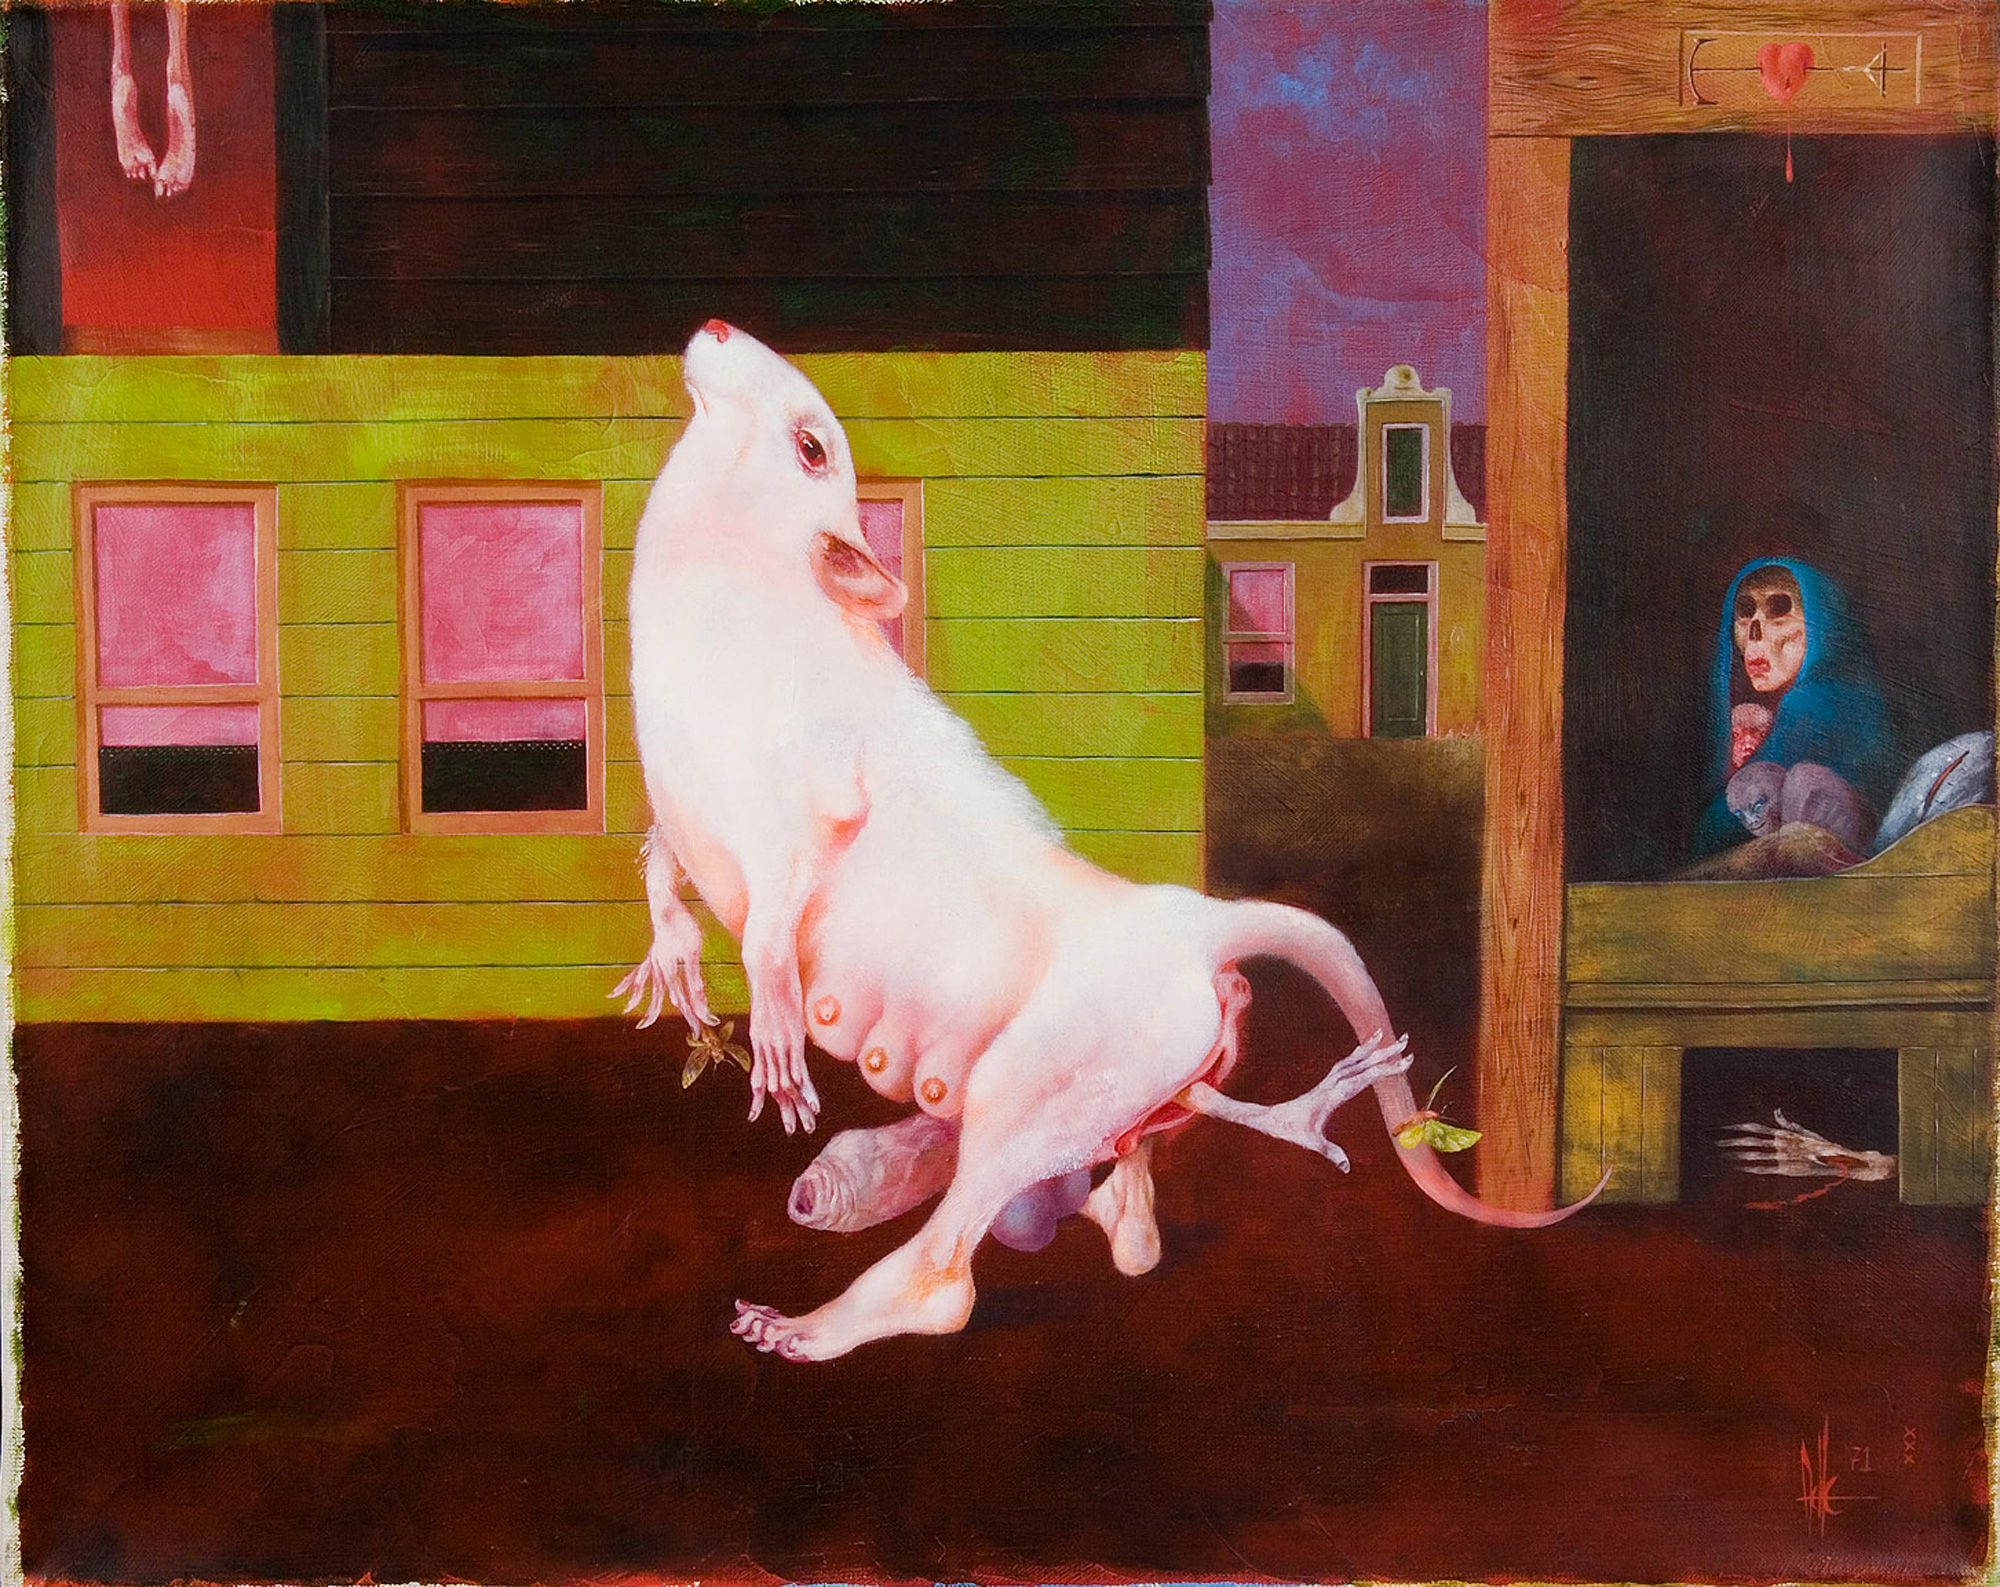 Melle schilder | Perpetuum mobile, olieverf op linnen